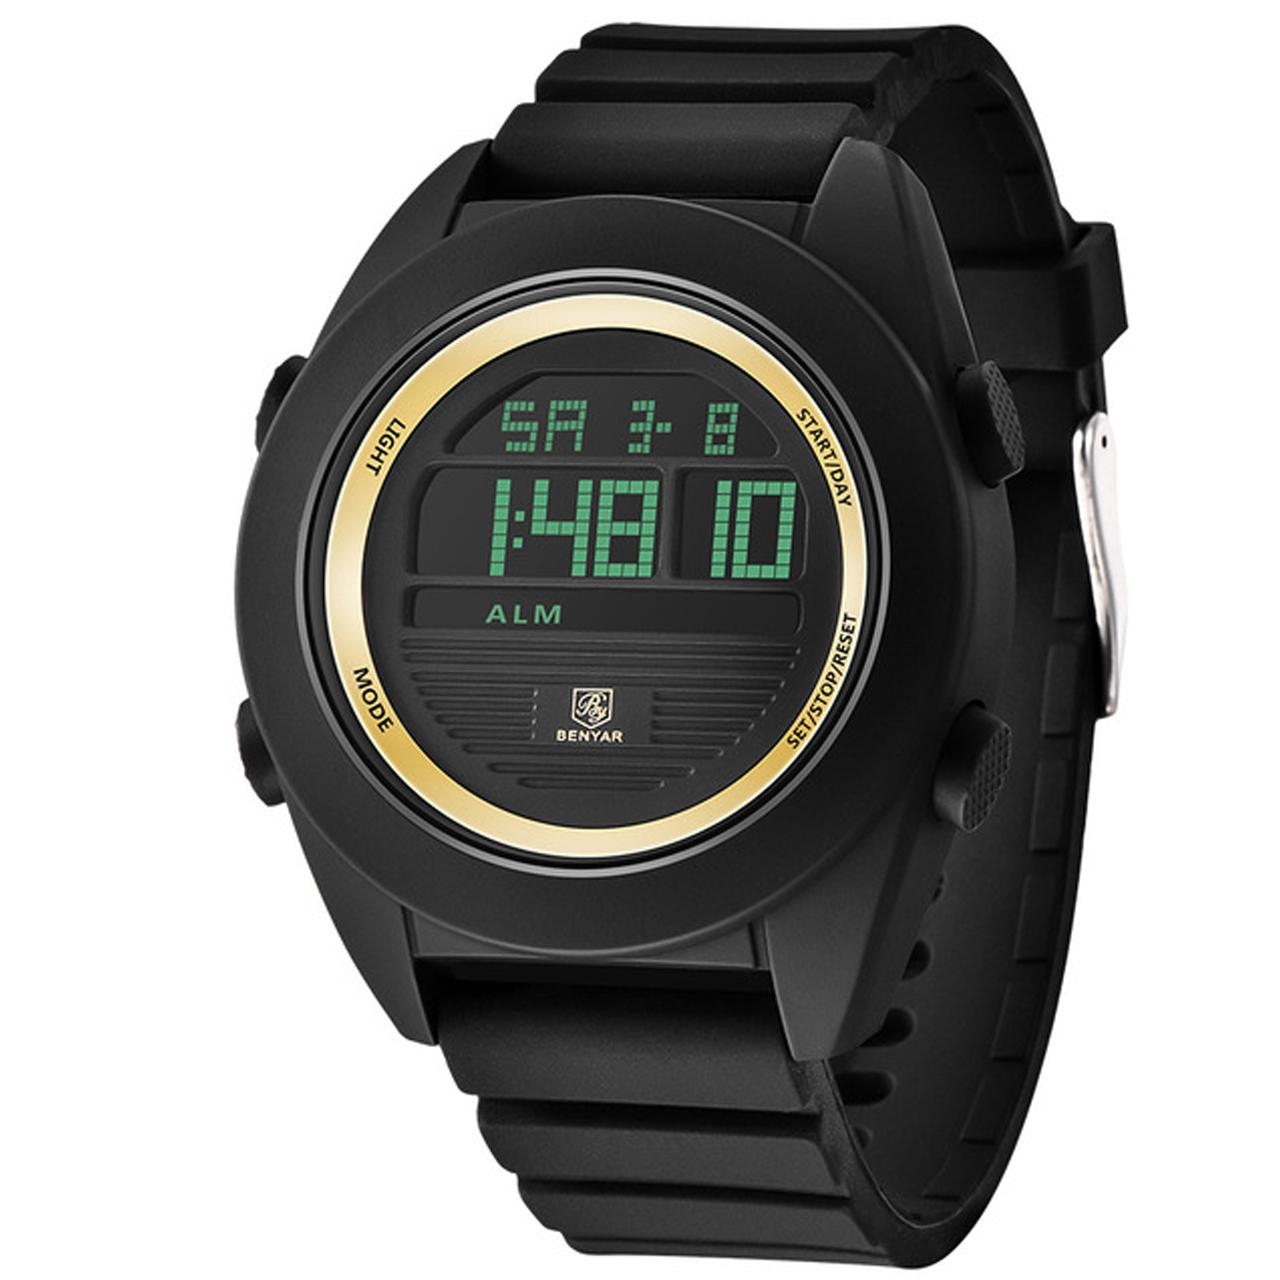 ساعت مچی دیجیتالی مردانه بنیار مدل 8002G 16